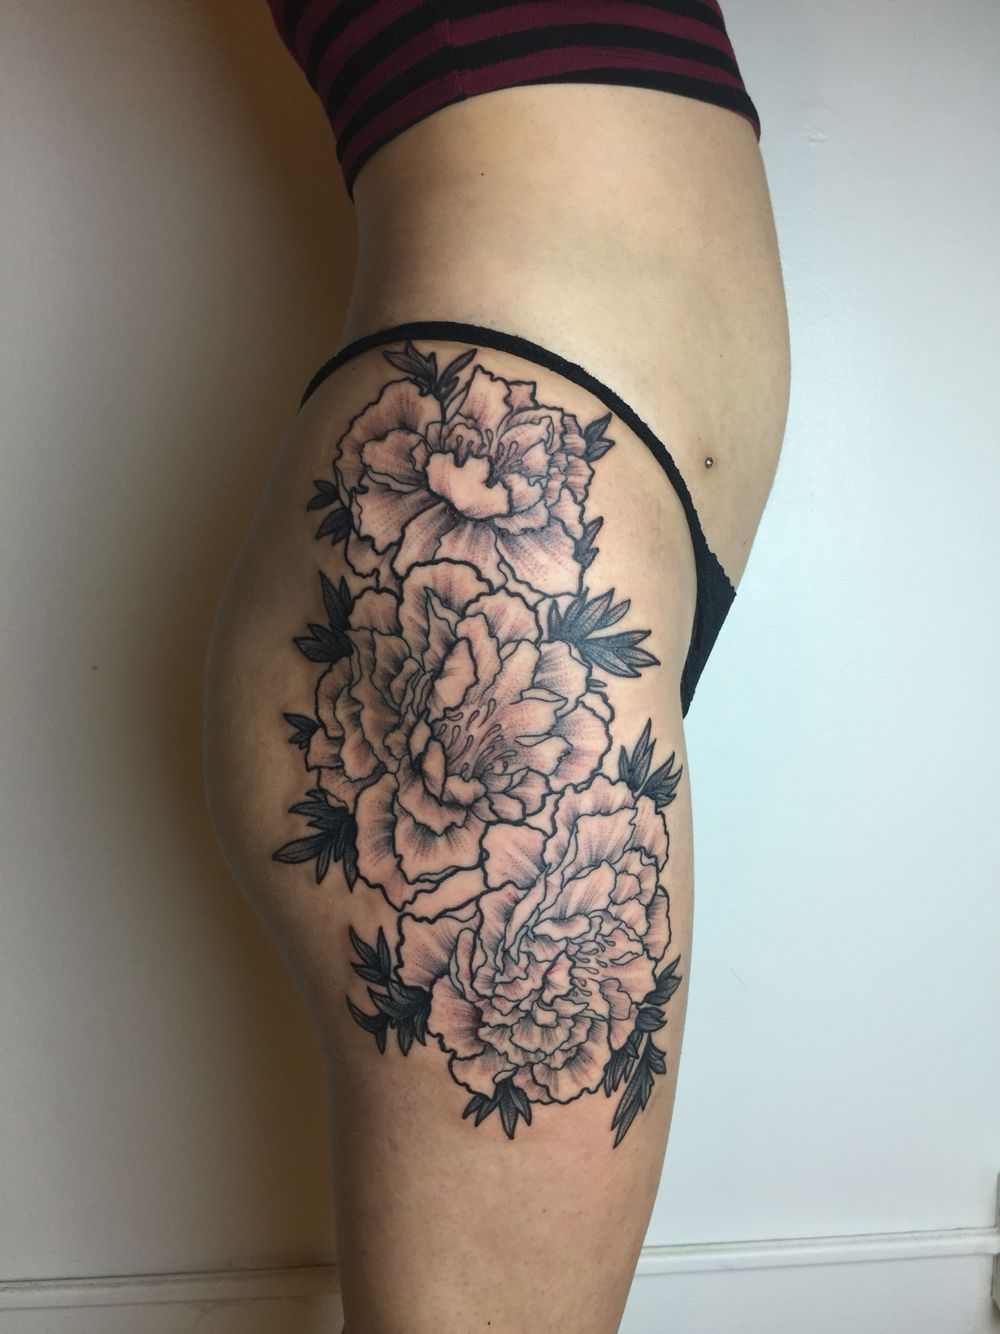 Peony flower thigh piece tattoo tattoo pinterest thigh piece peony flower thigh piece tattoo biocorpaavc Images